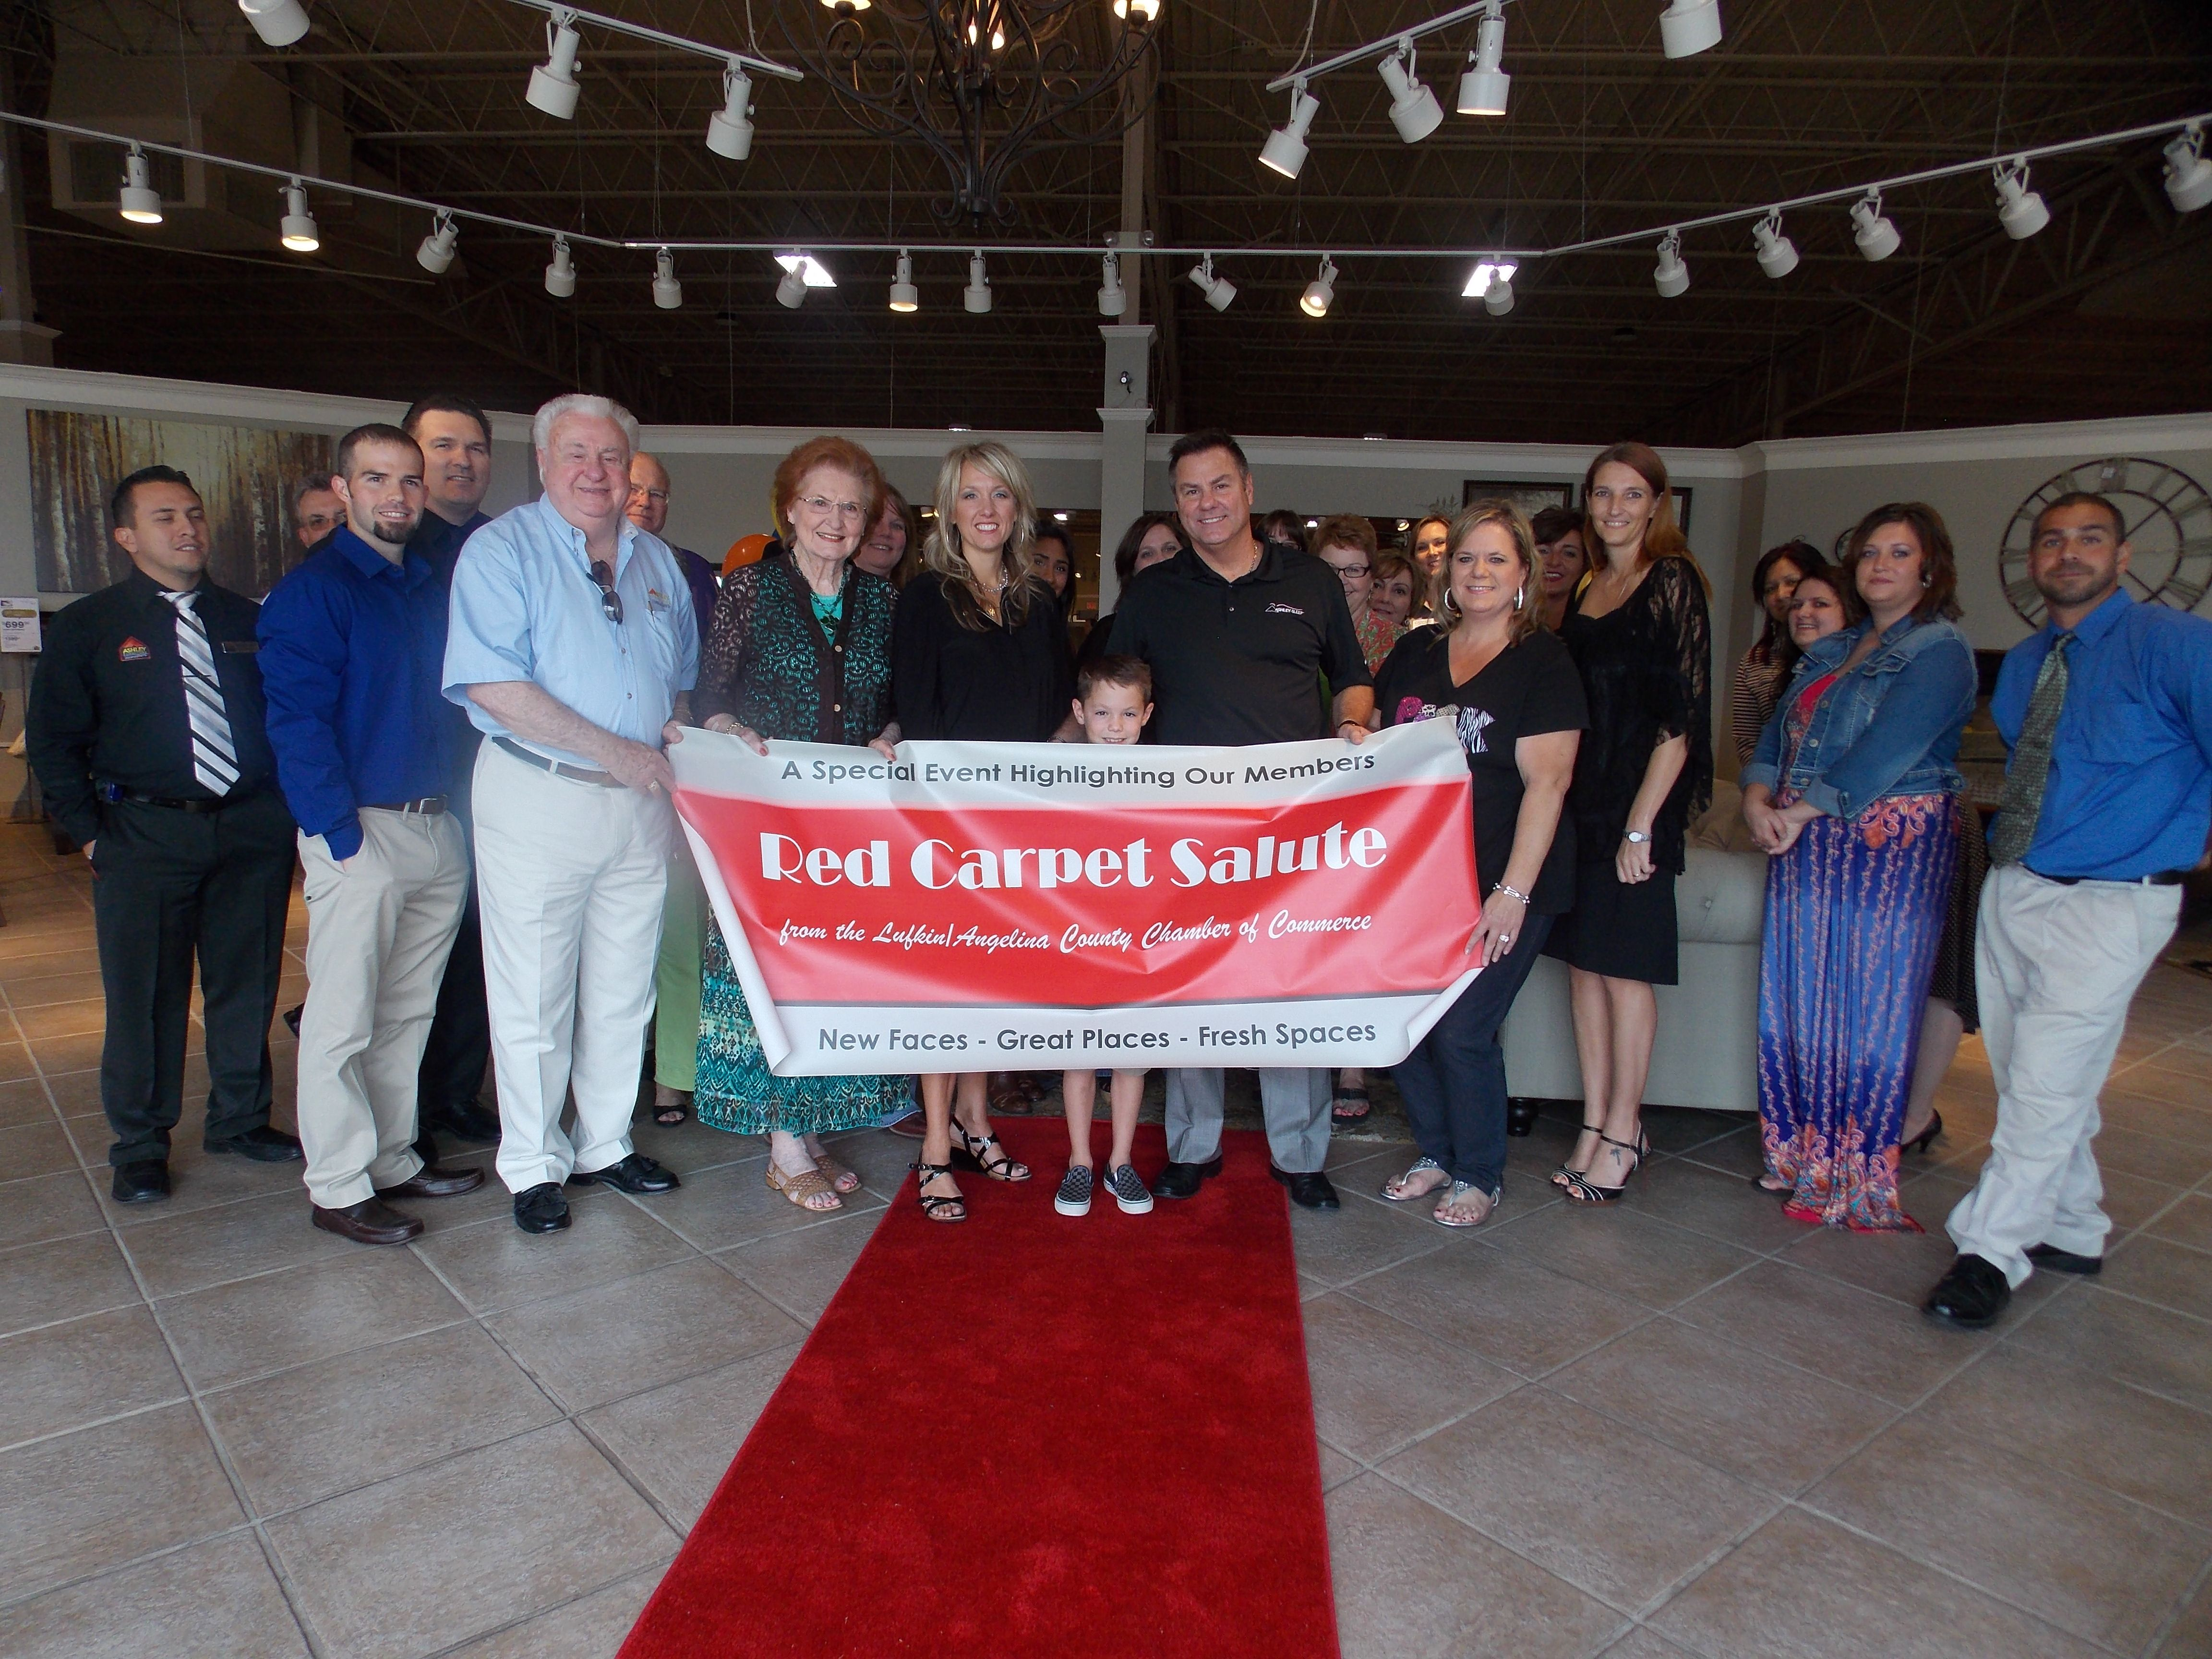 Red Carpet Salute For Ashley Furniture HomeStoreu0027s Grand Re Opening!